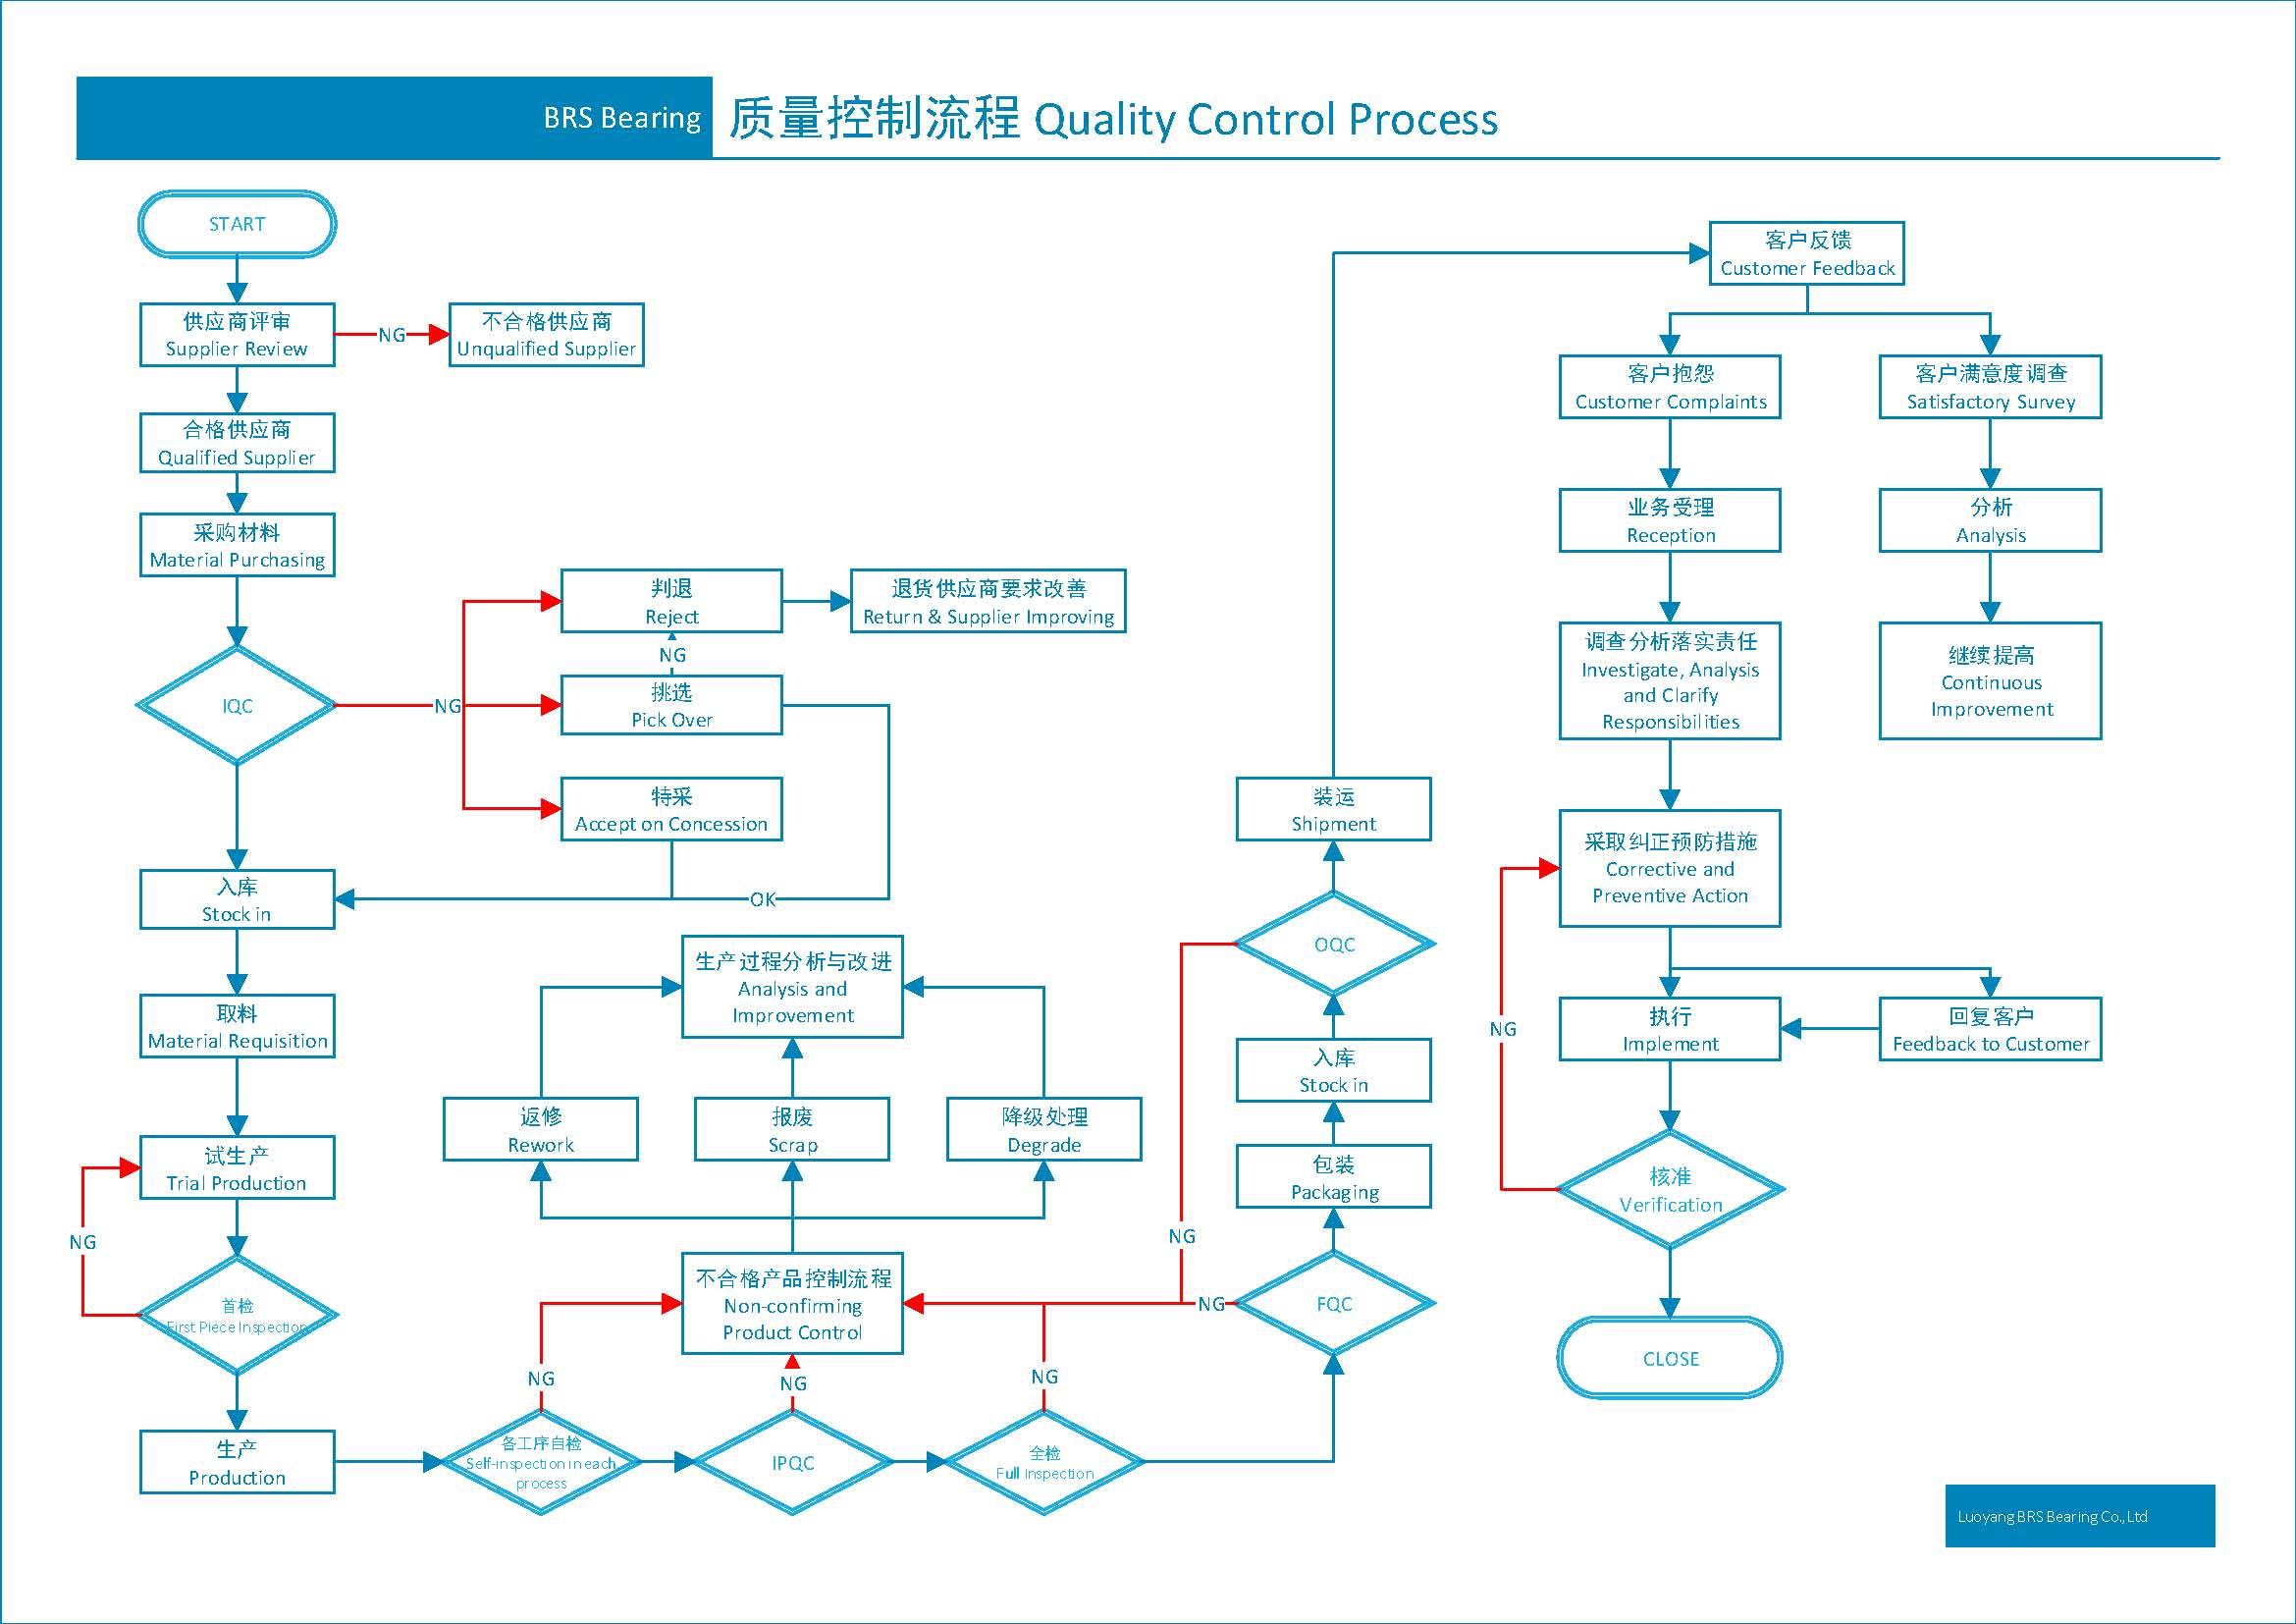 Bearing quality control process